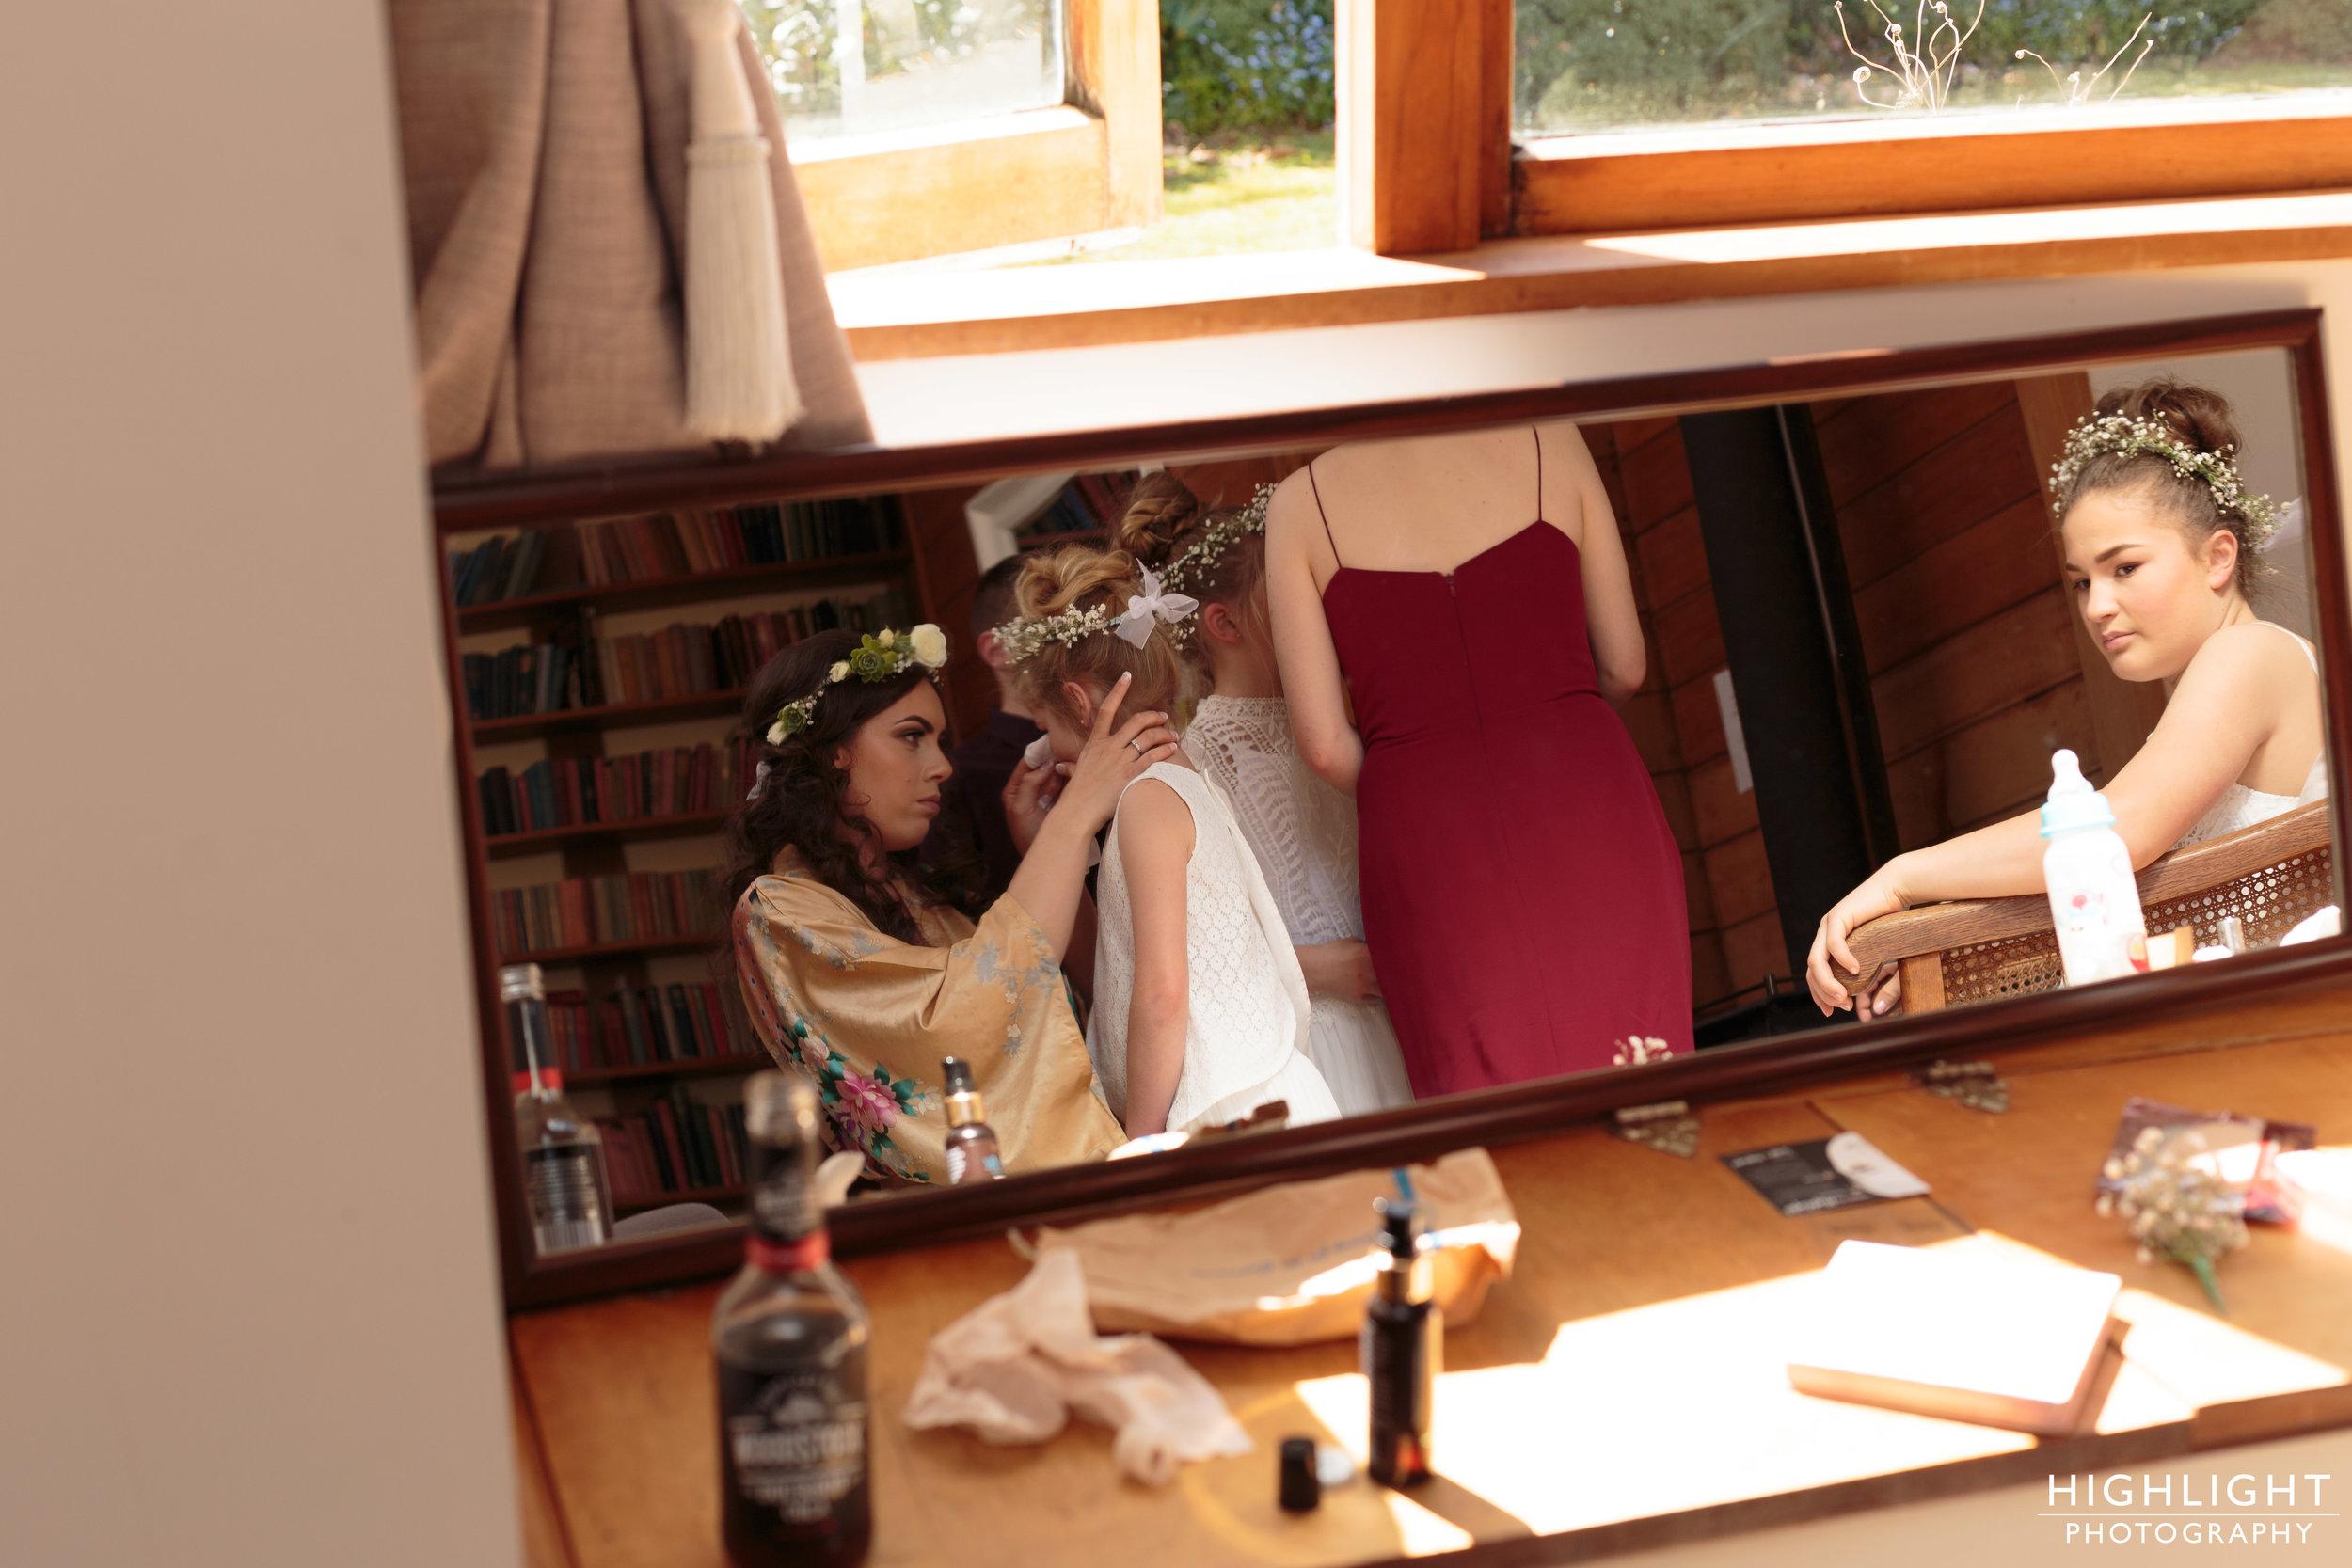 highlight_wedding_photography_makoura_lodge_manawatu_new_zealand-39.jpg